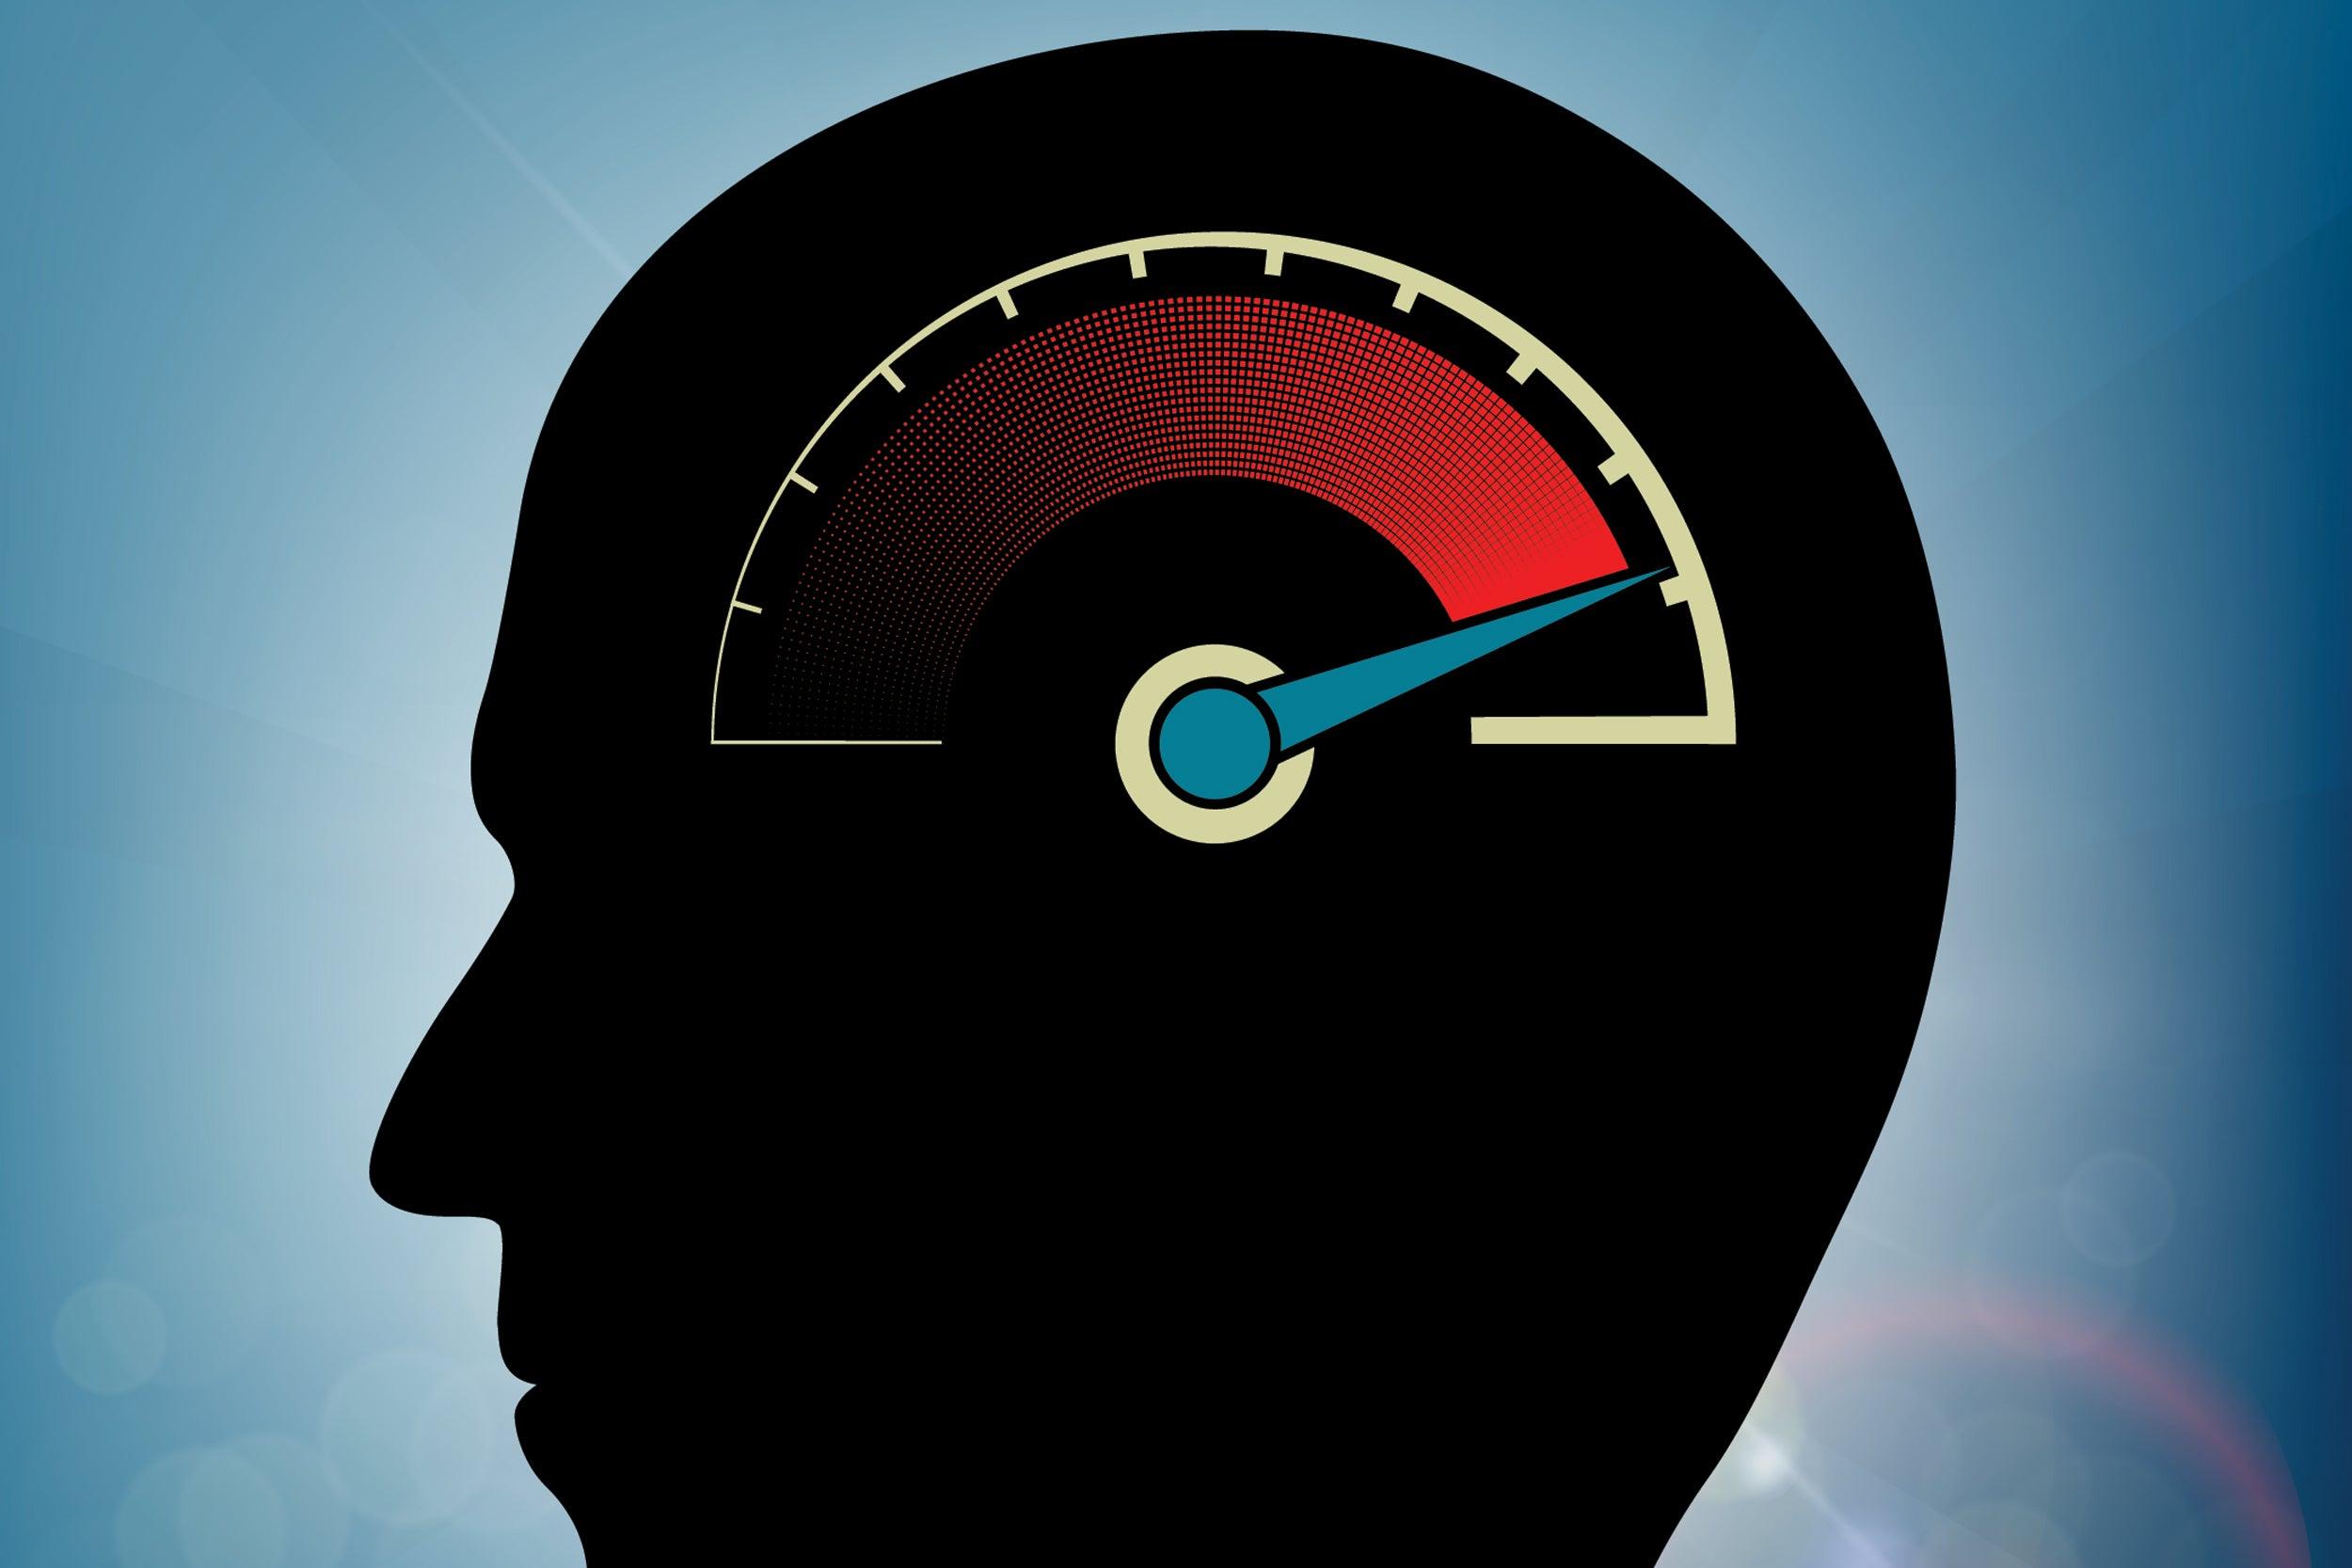 Oxytocin Found To Stimulate Social >> A Volume Control For The Brain Harvard Gazette